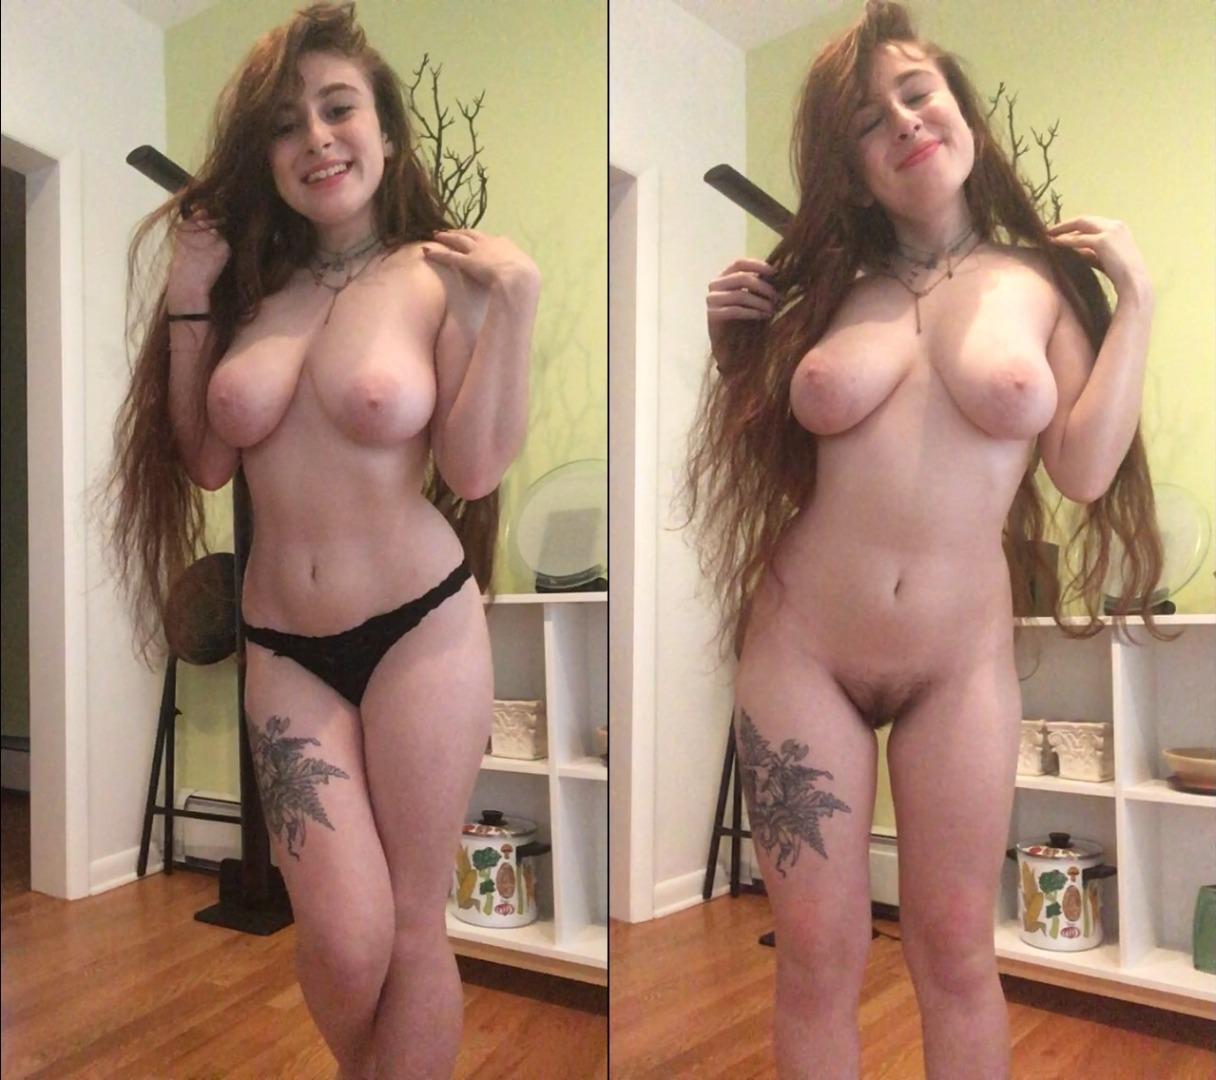 french beauty movie porn french beauty sex tube fuck free porn videos porn jpg